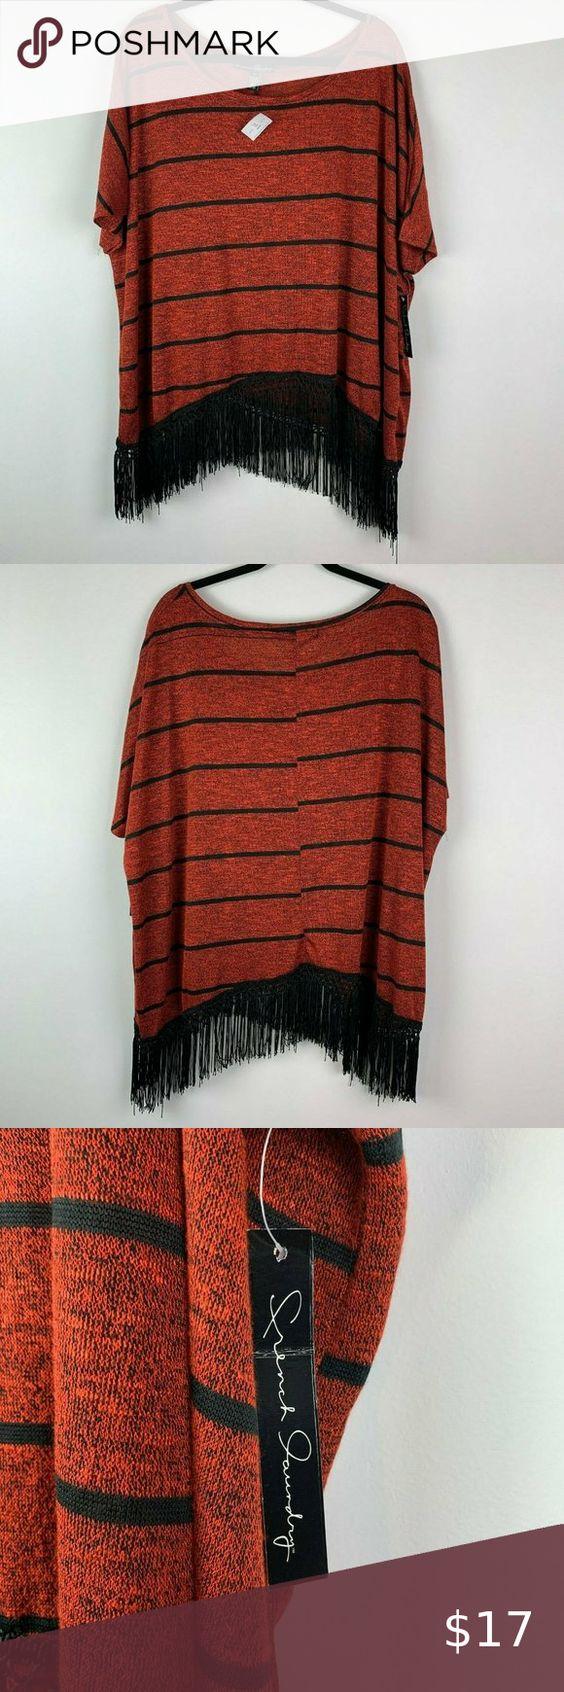 French Laundry Rust Strip Boho Shirt Short Web Sle In 2020 Boho Shirts Shirts Clothes Design